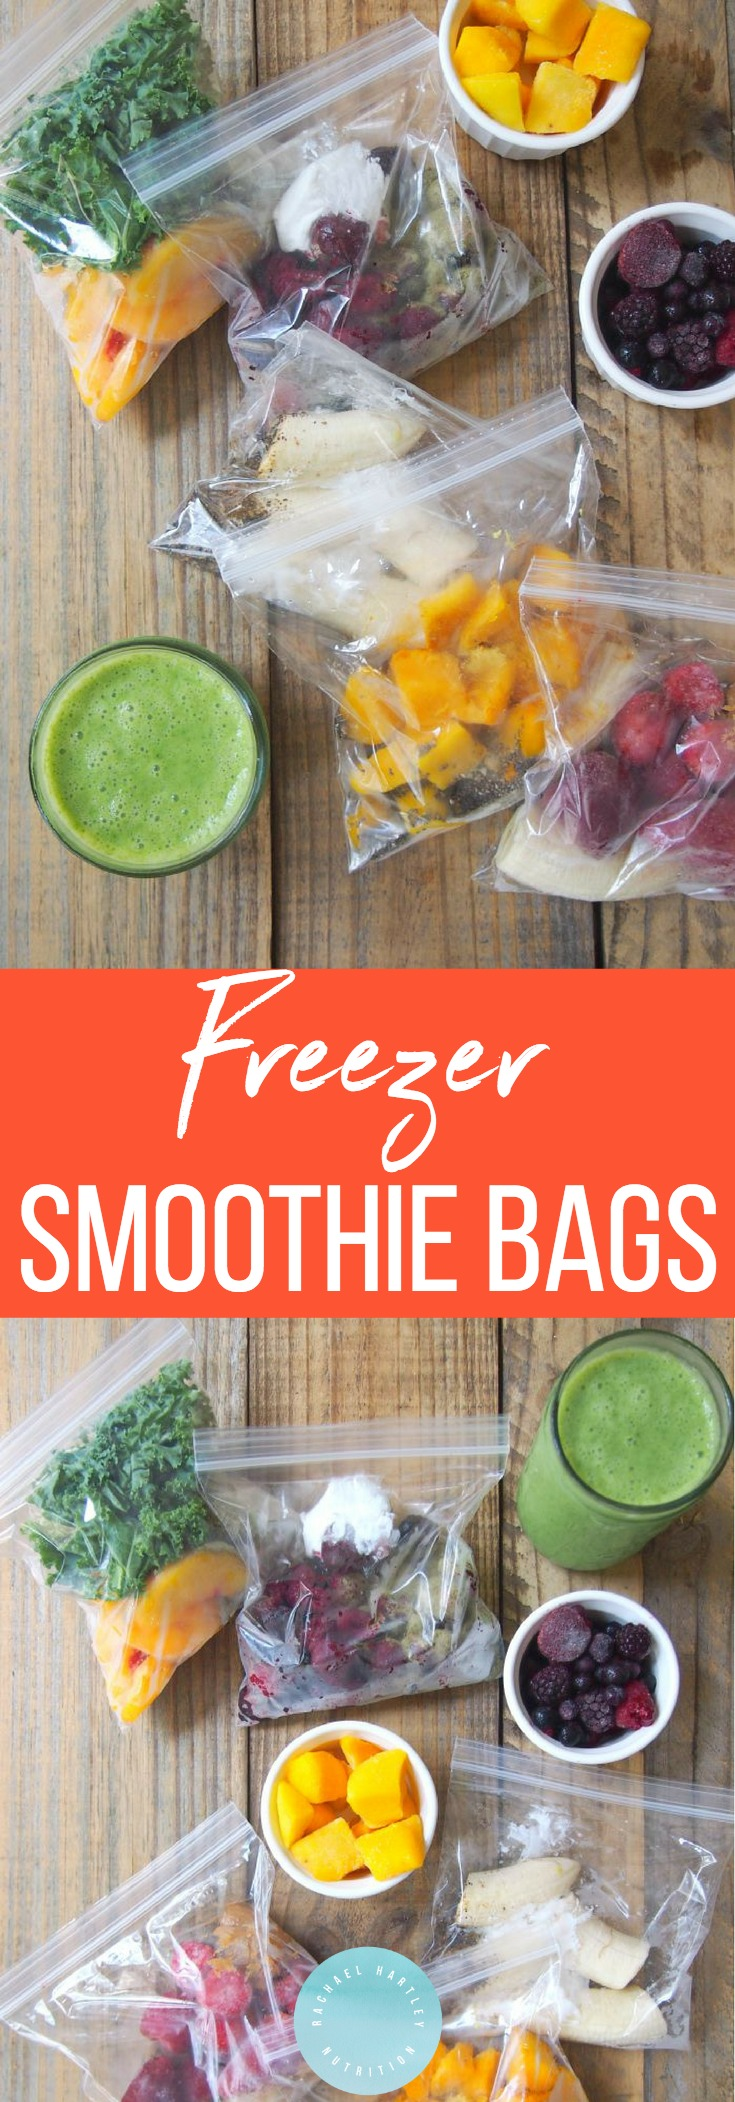 Freezer Smoothie Bags